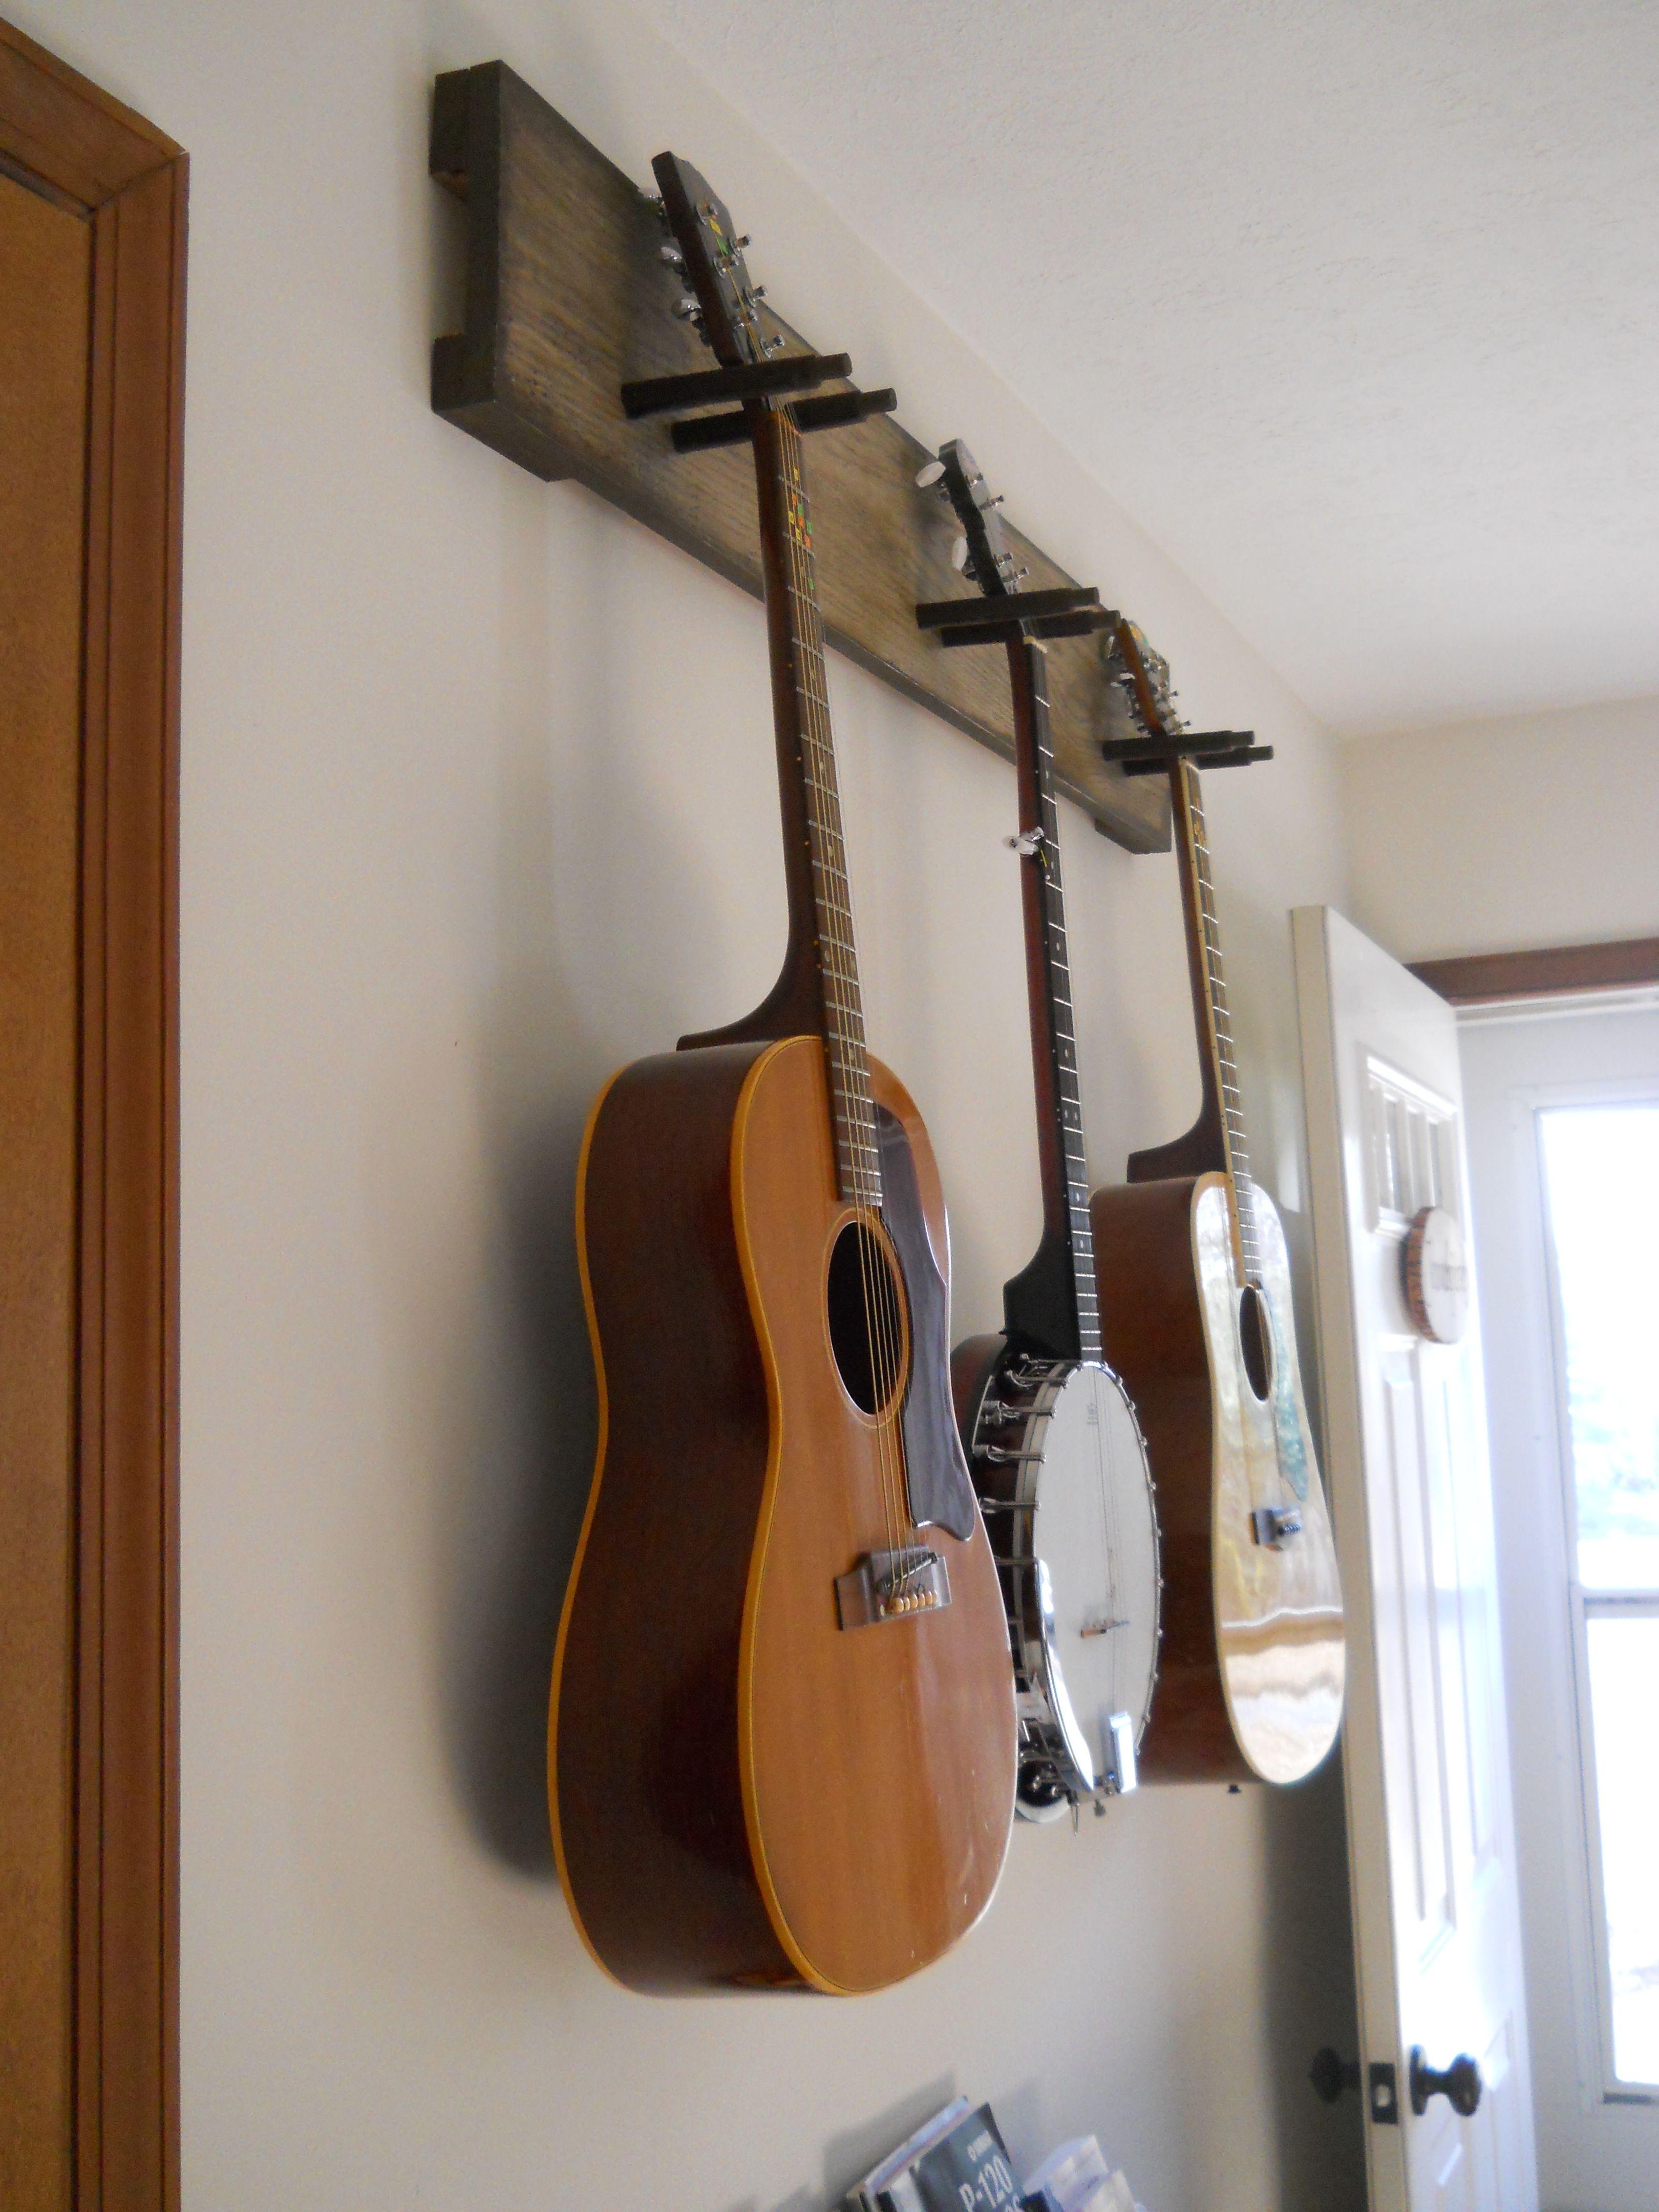 Diy Guitar Hanger Simple Amp Secure We Practice So Much